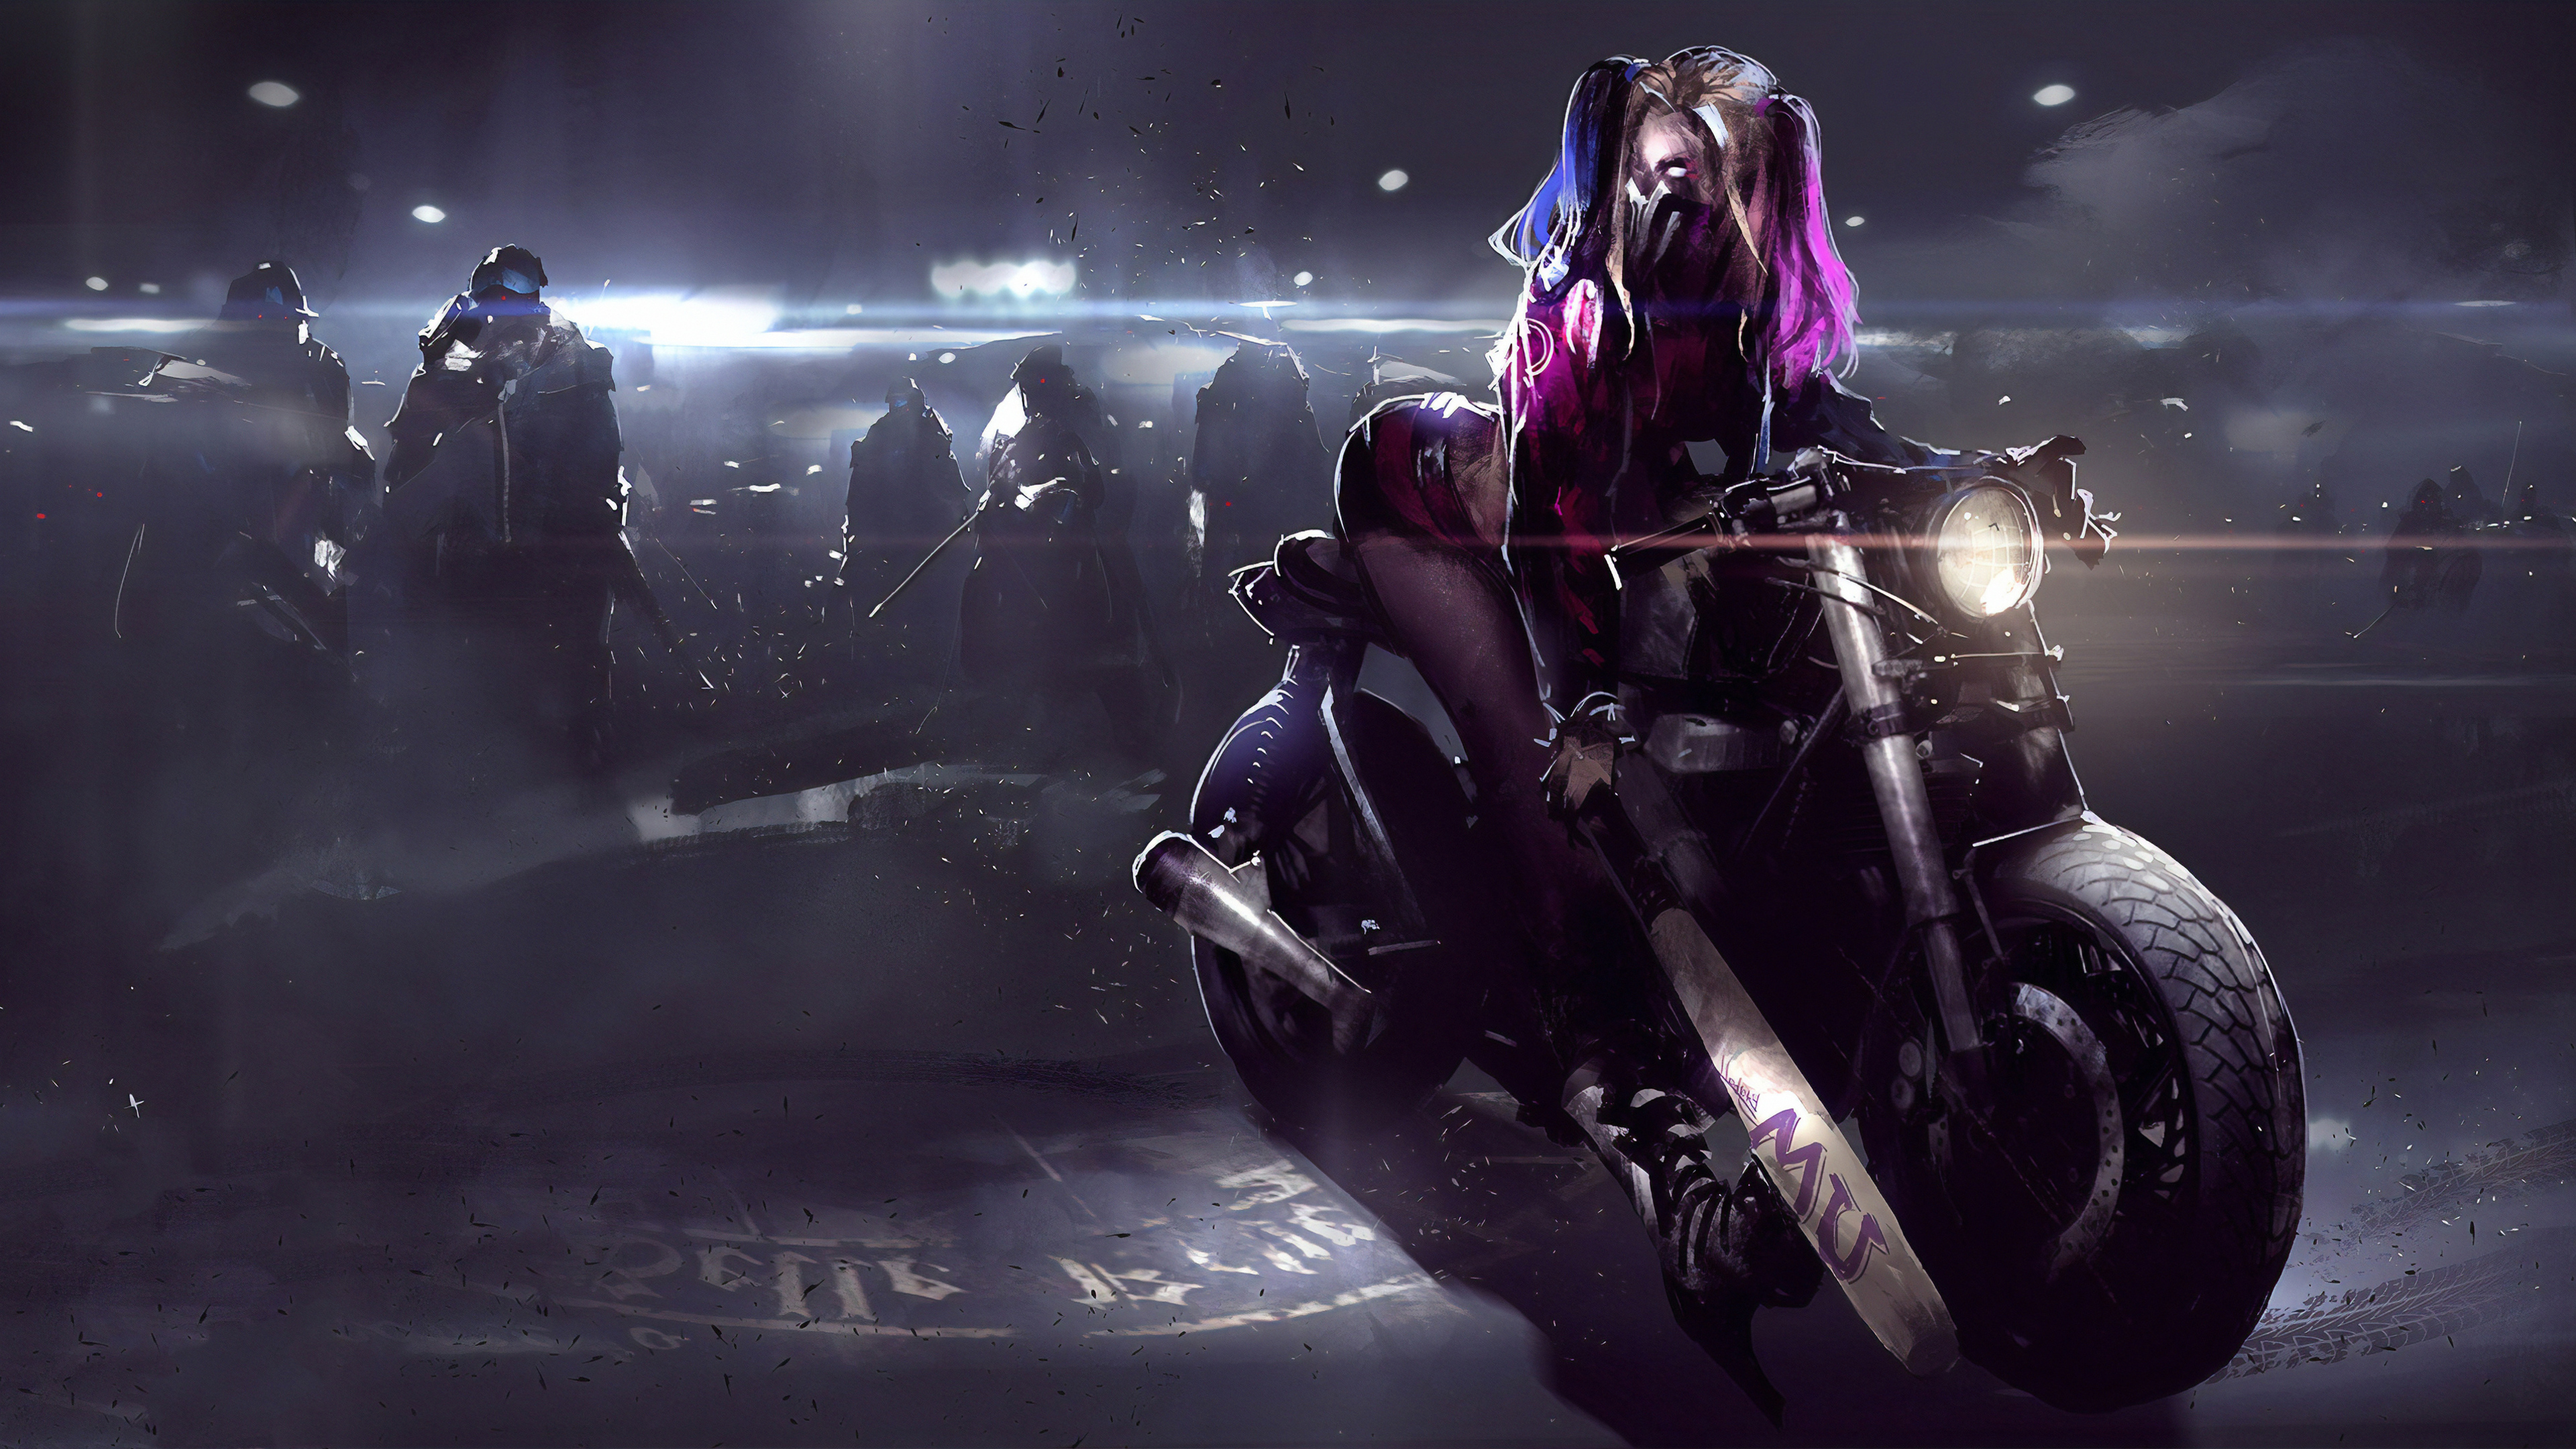 View Harley Quinn Wallpaper Hd 4K Background